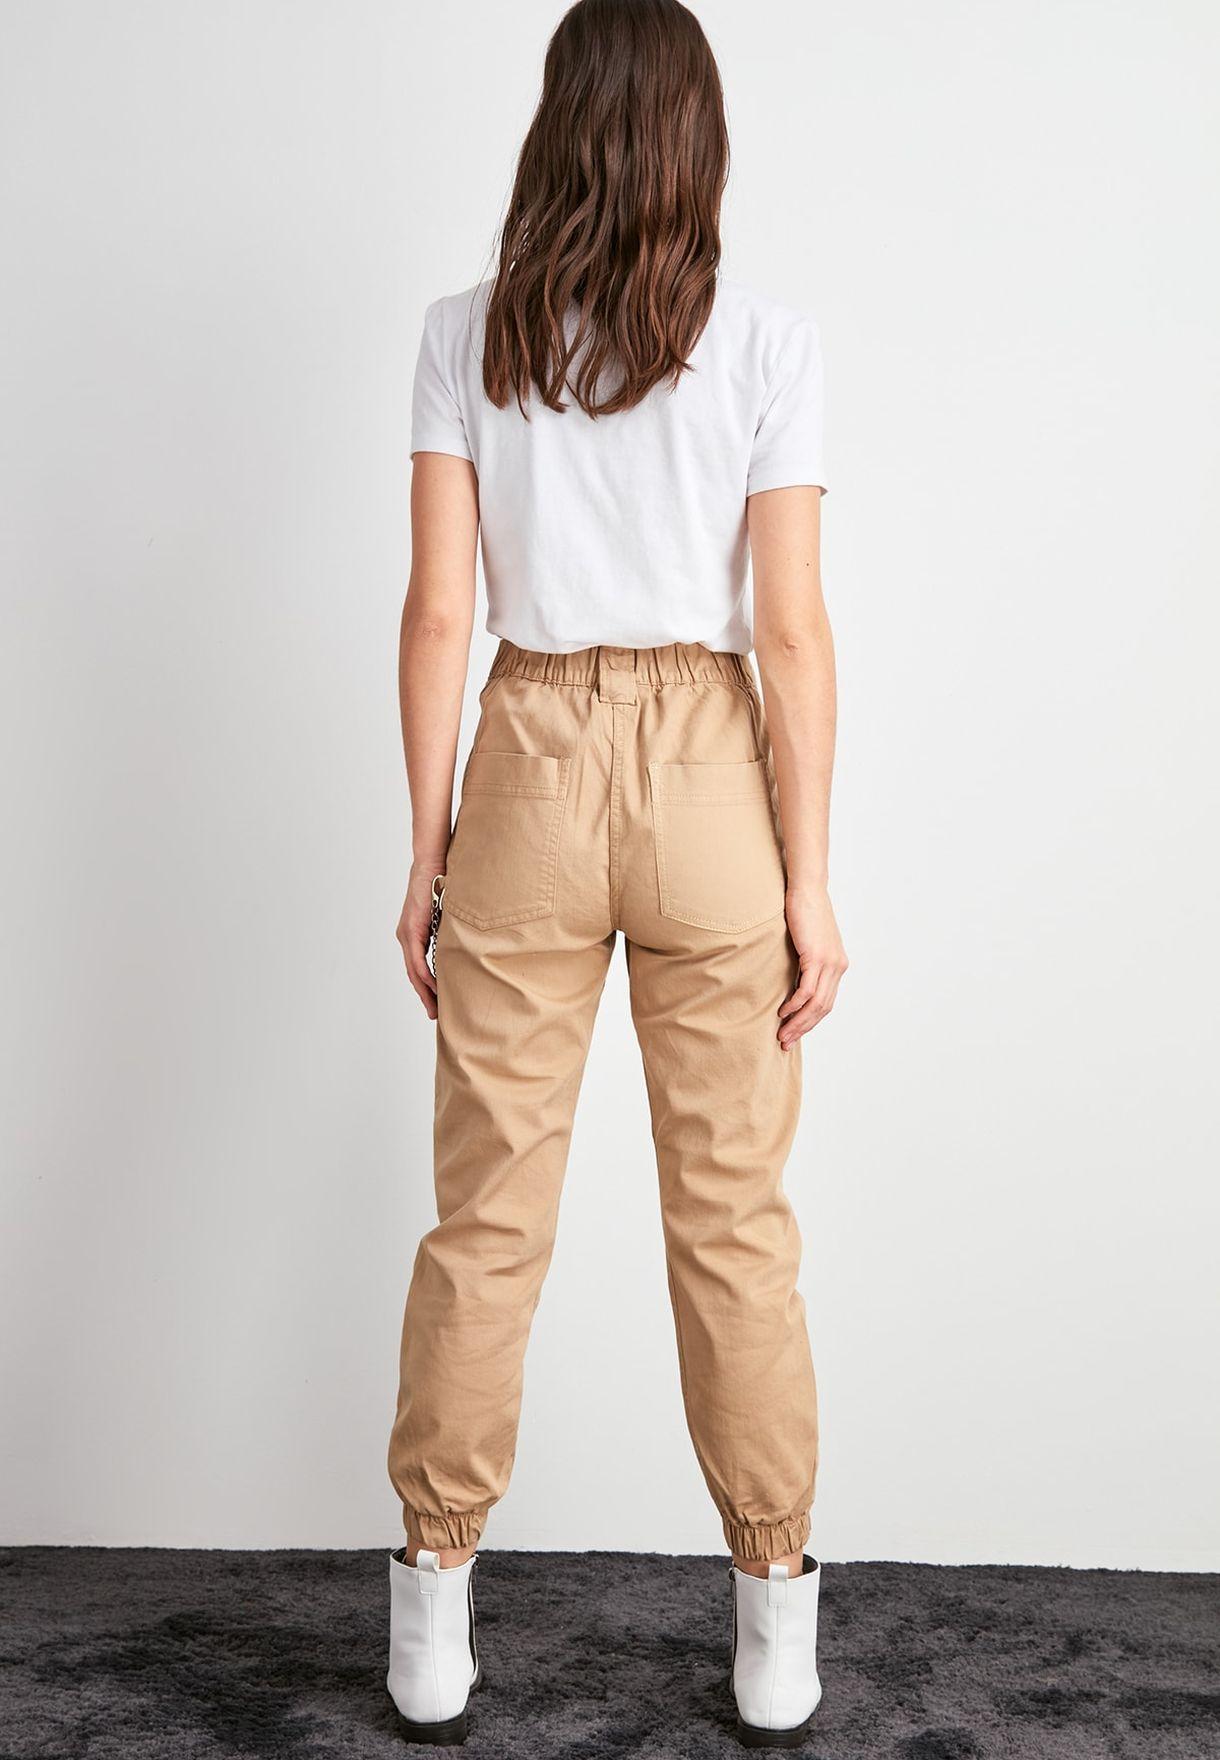 High Waist Cuffed Jeans